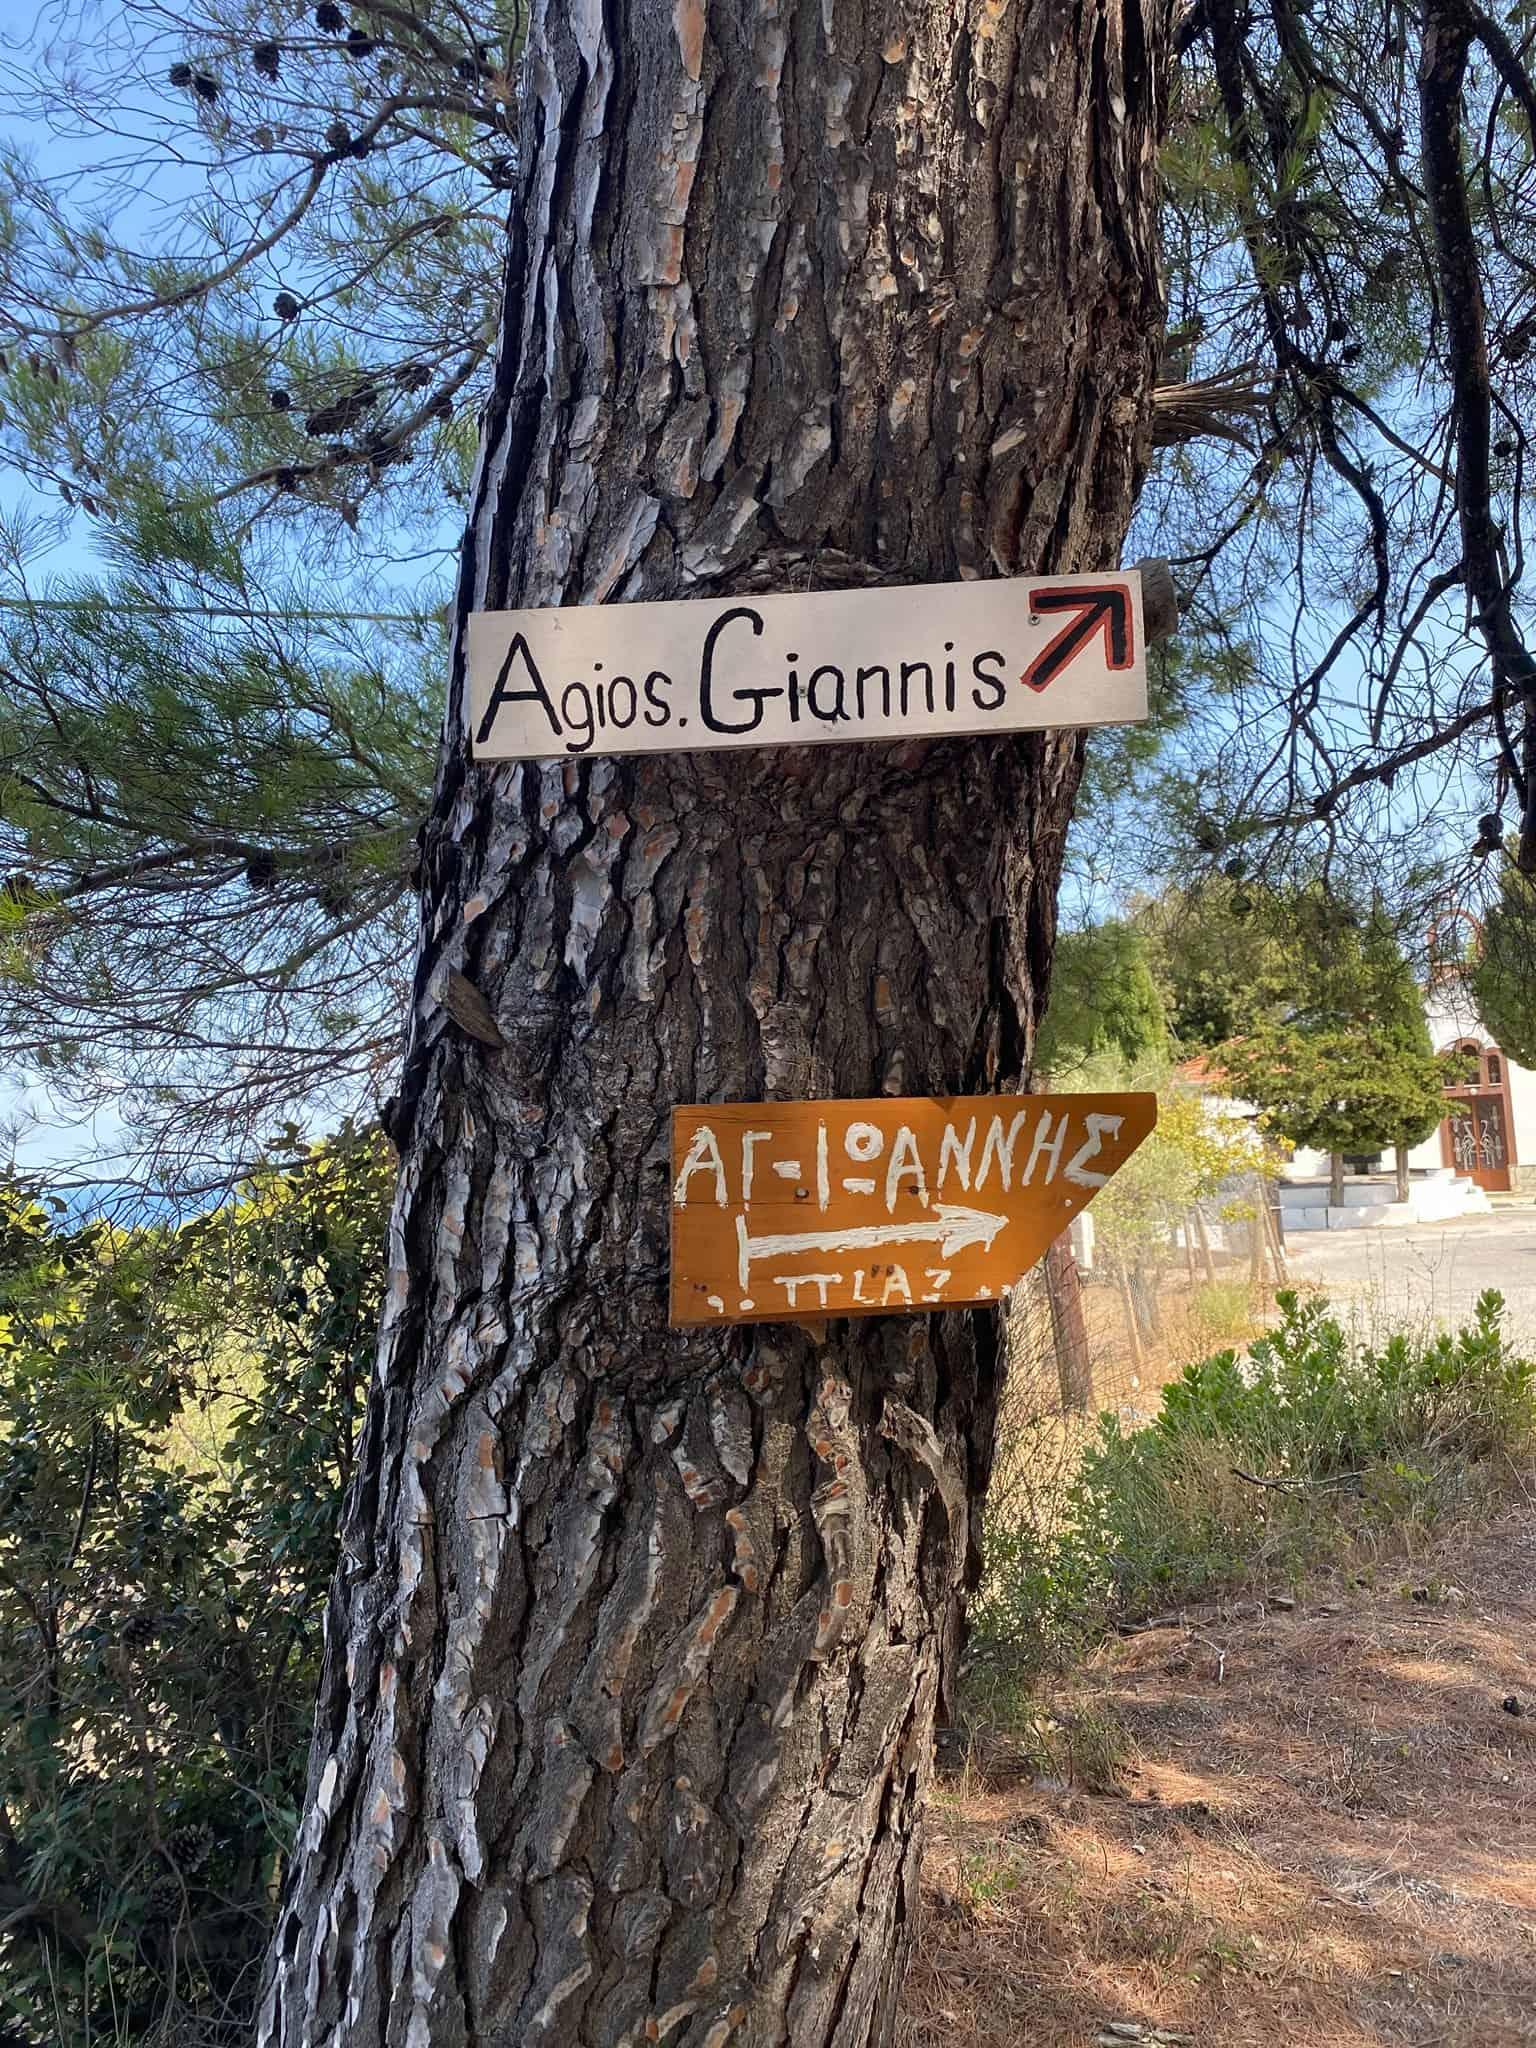 Hiking from Glossa to the Mamma Mia church